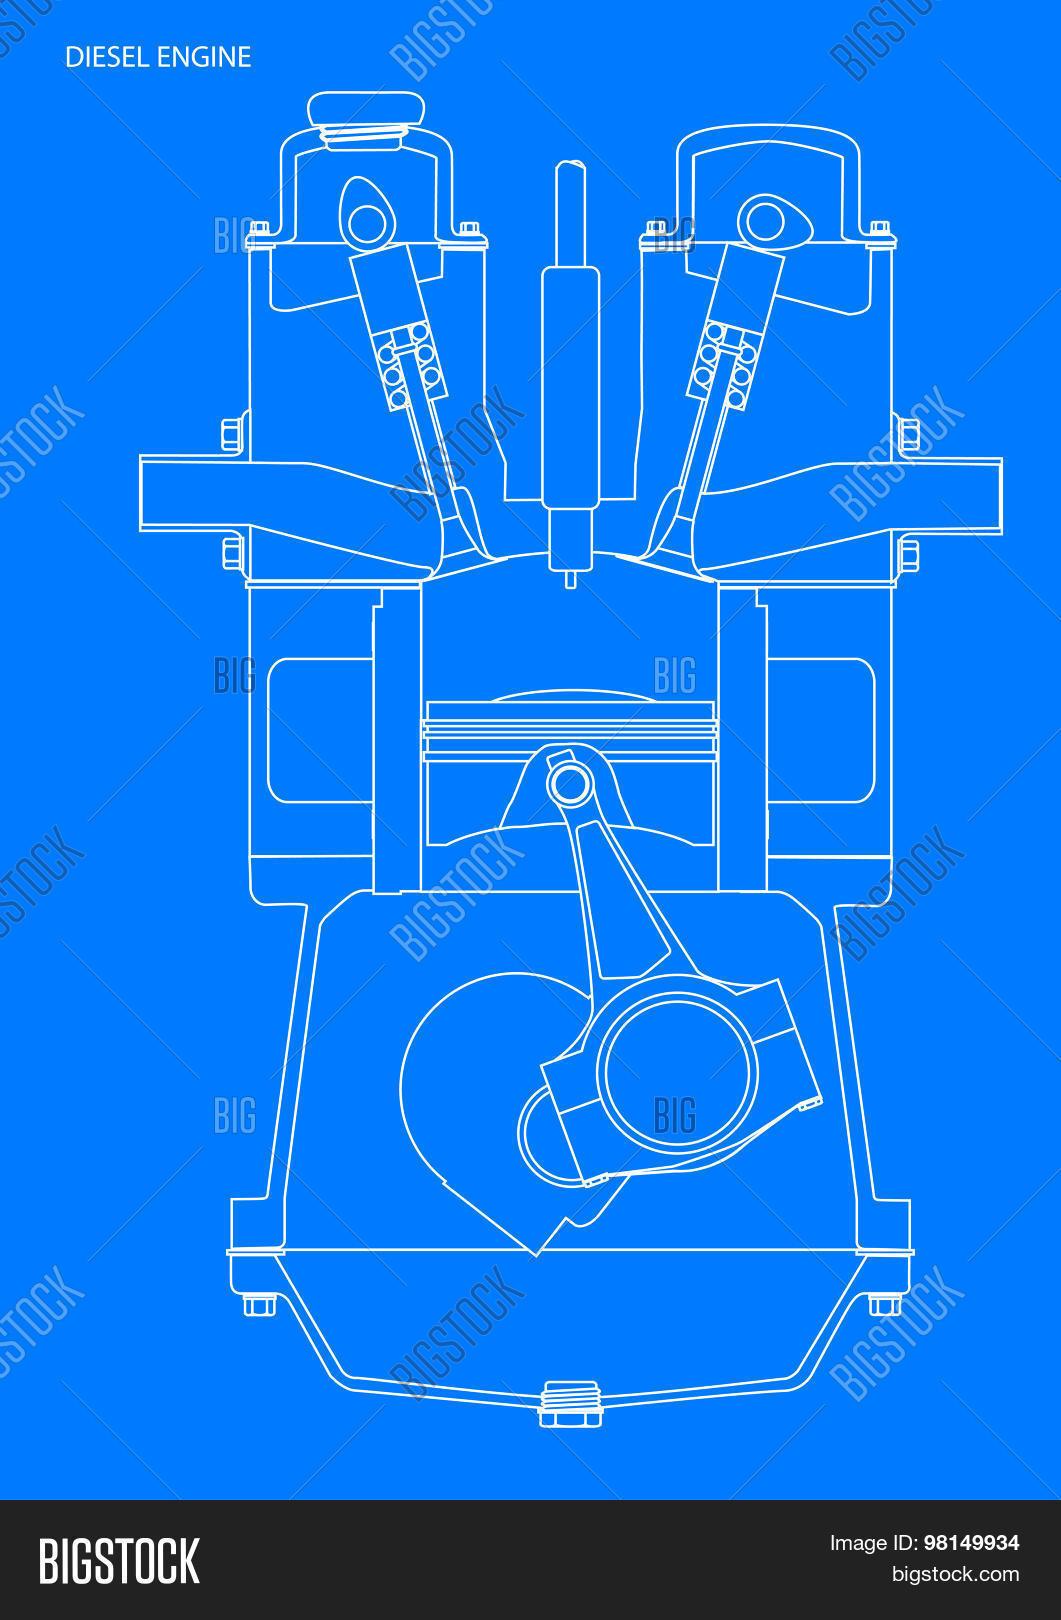 Diesel engine blueprint vector photo bigstock diesel engine blueprint malvernweather Images